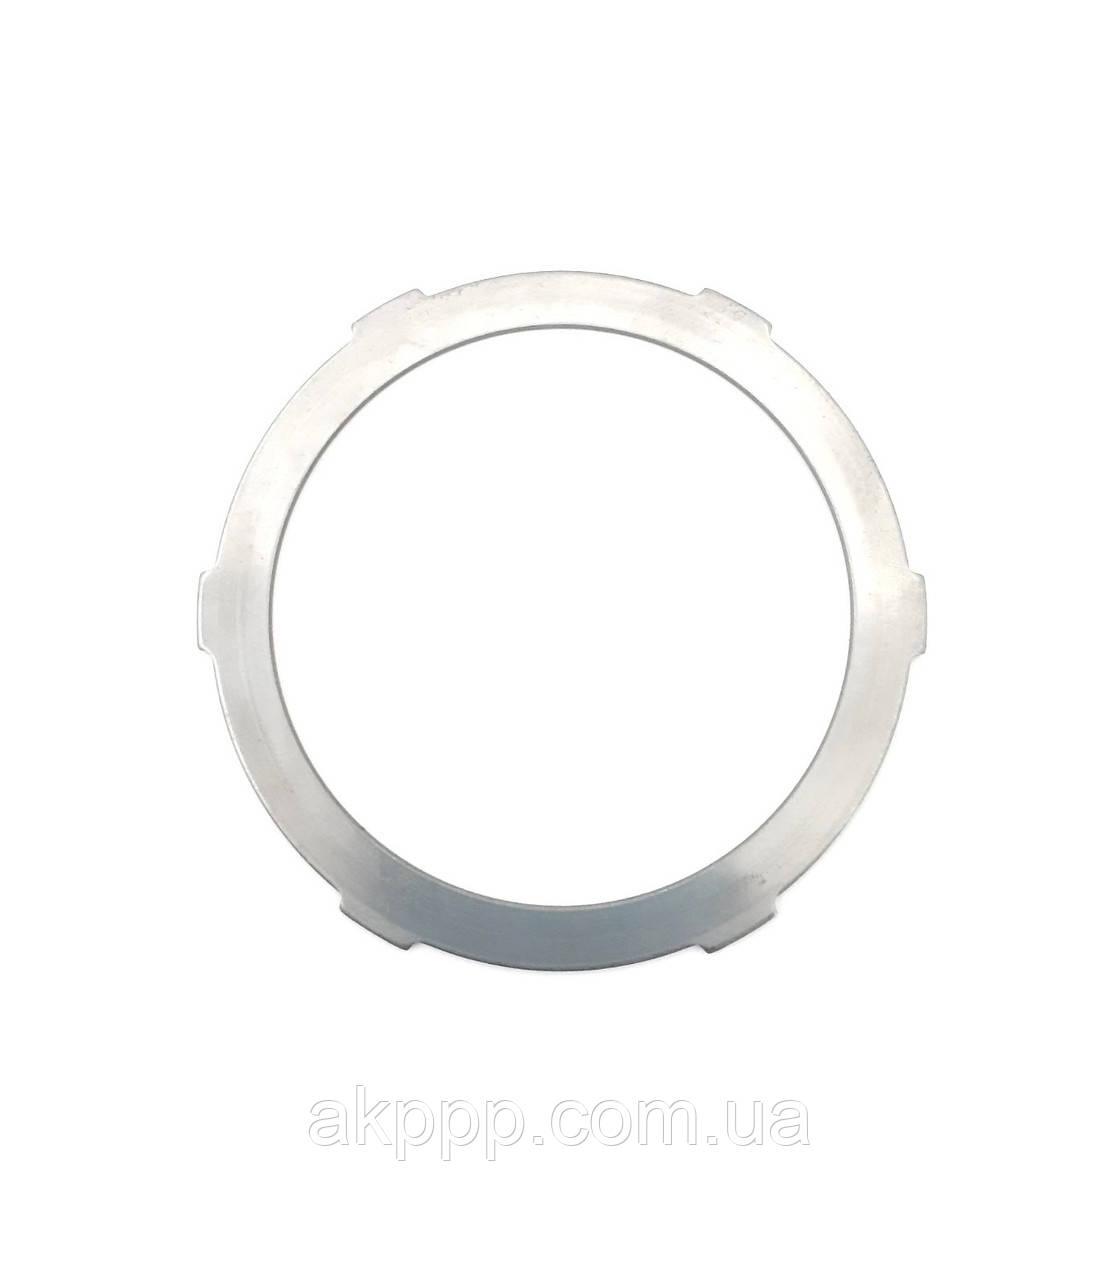 Нажимной диск акпп 5L40E (2/104/126 мм) б/у